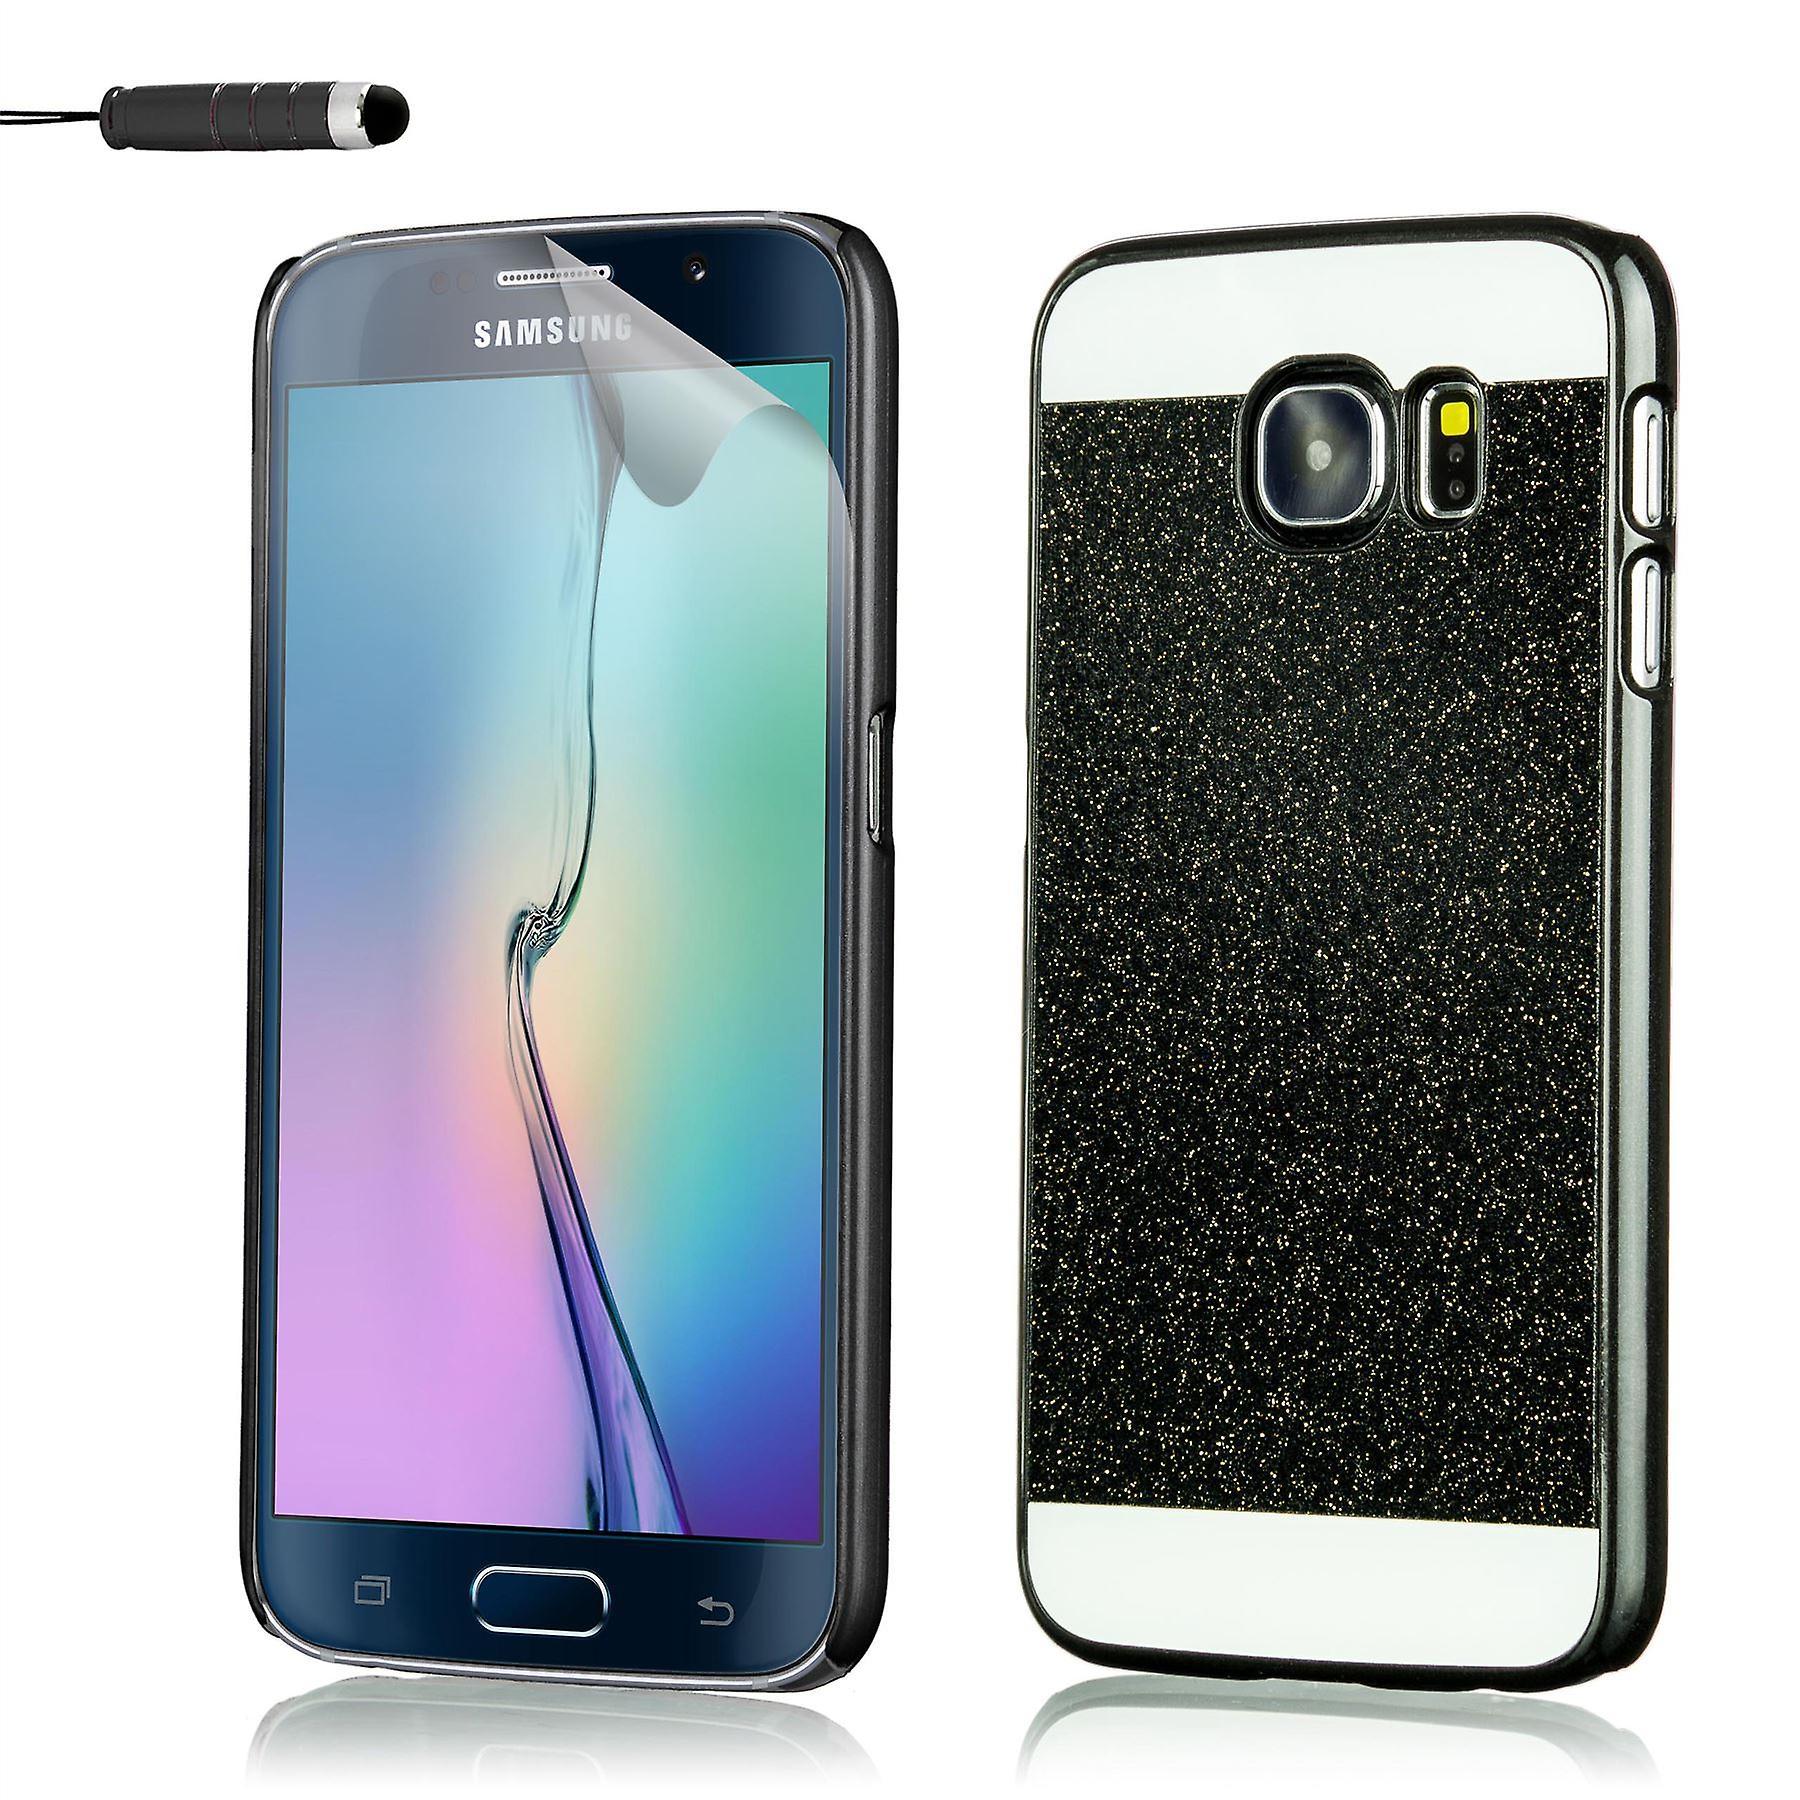 Glitter case + stylus for Samsung Galaxy S7 Edge SM-G935 - Black